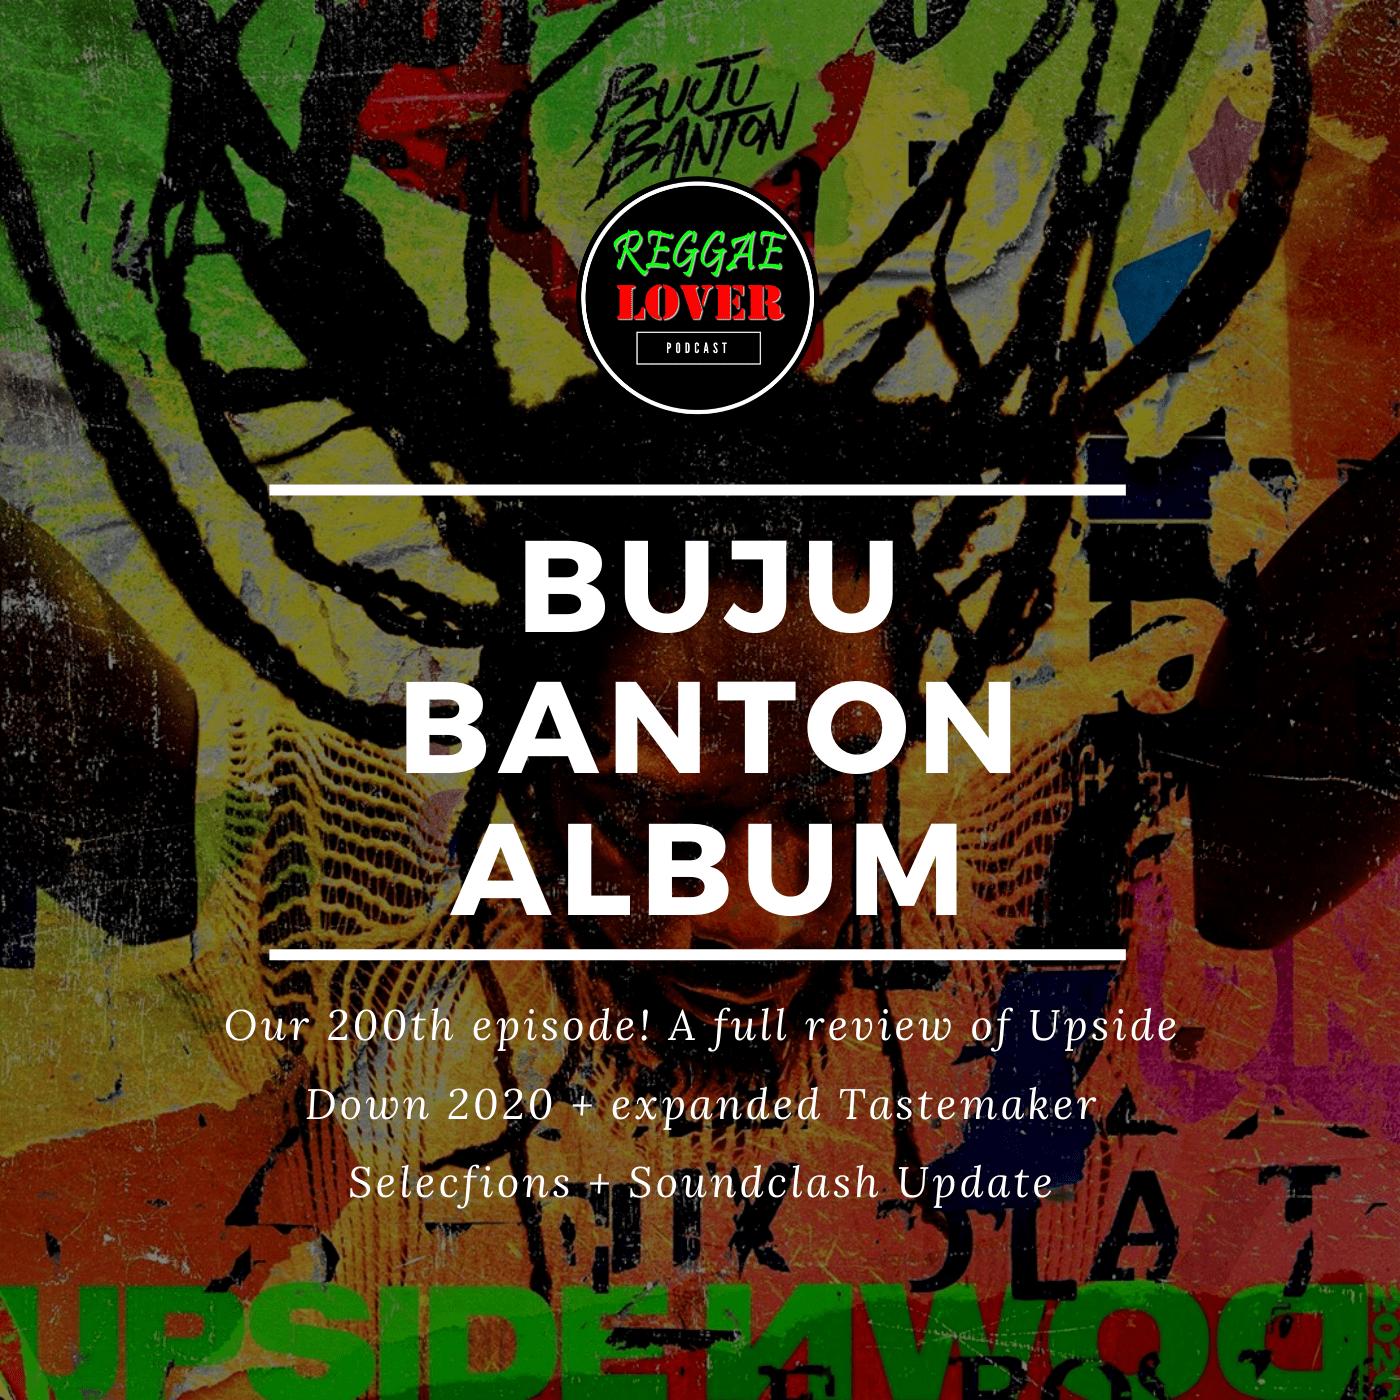 Buju Banton New Album Reggae Lover Upside Down 2020 Buju Banton Reggae Album Songs